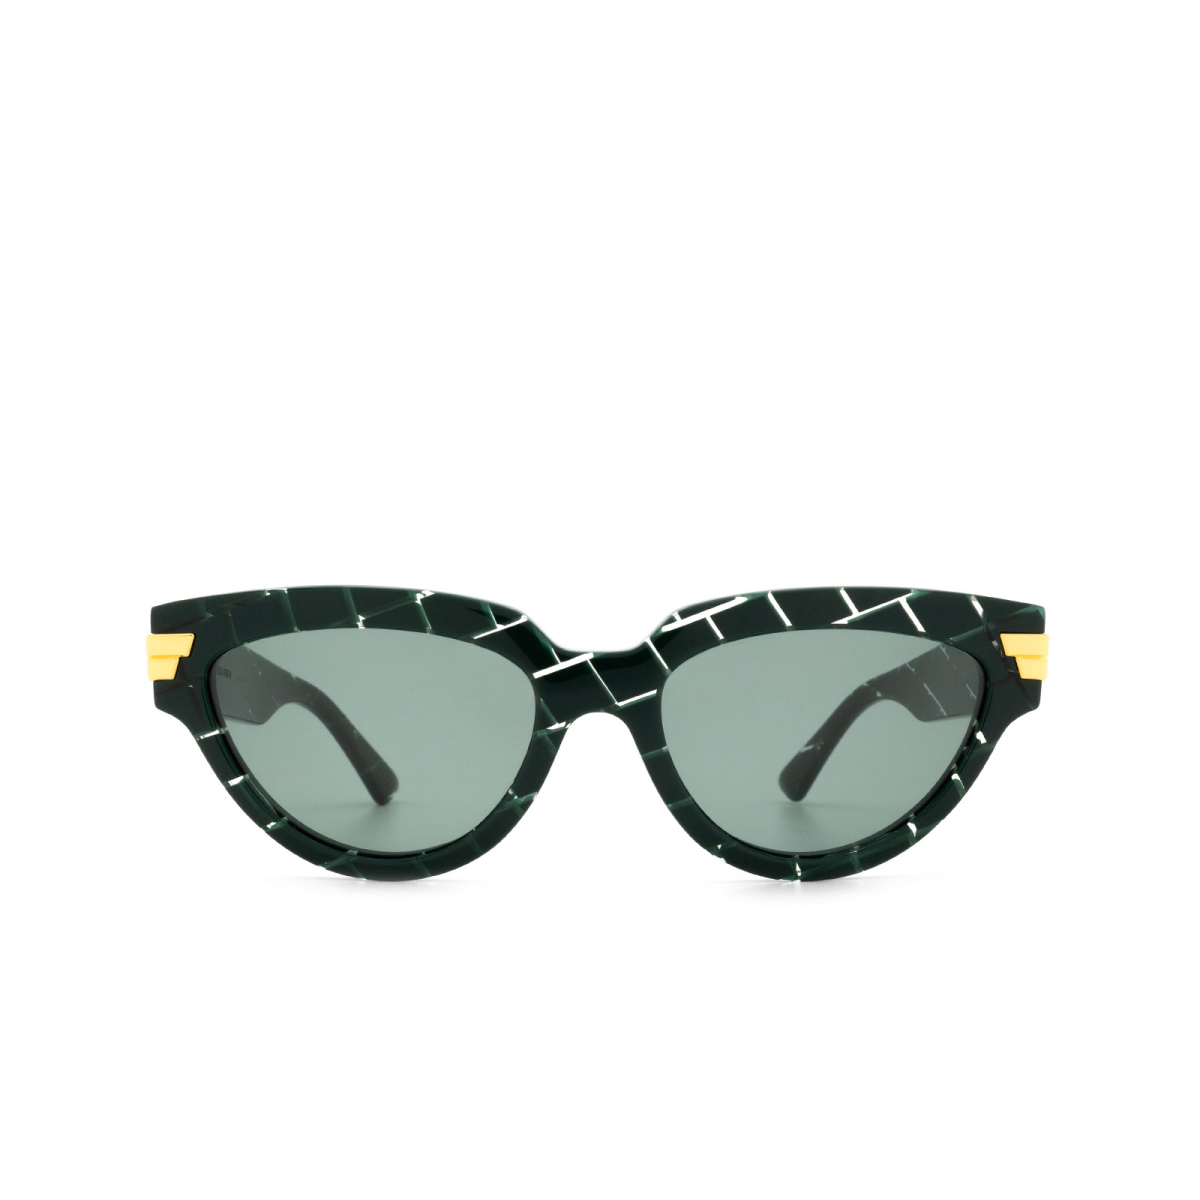 Bottega Veneta® Cat-eye Sunglasses: BV1035S color Green 004.